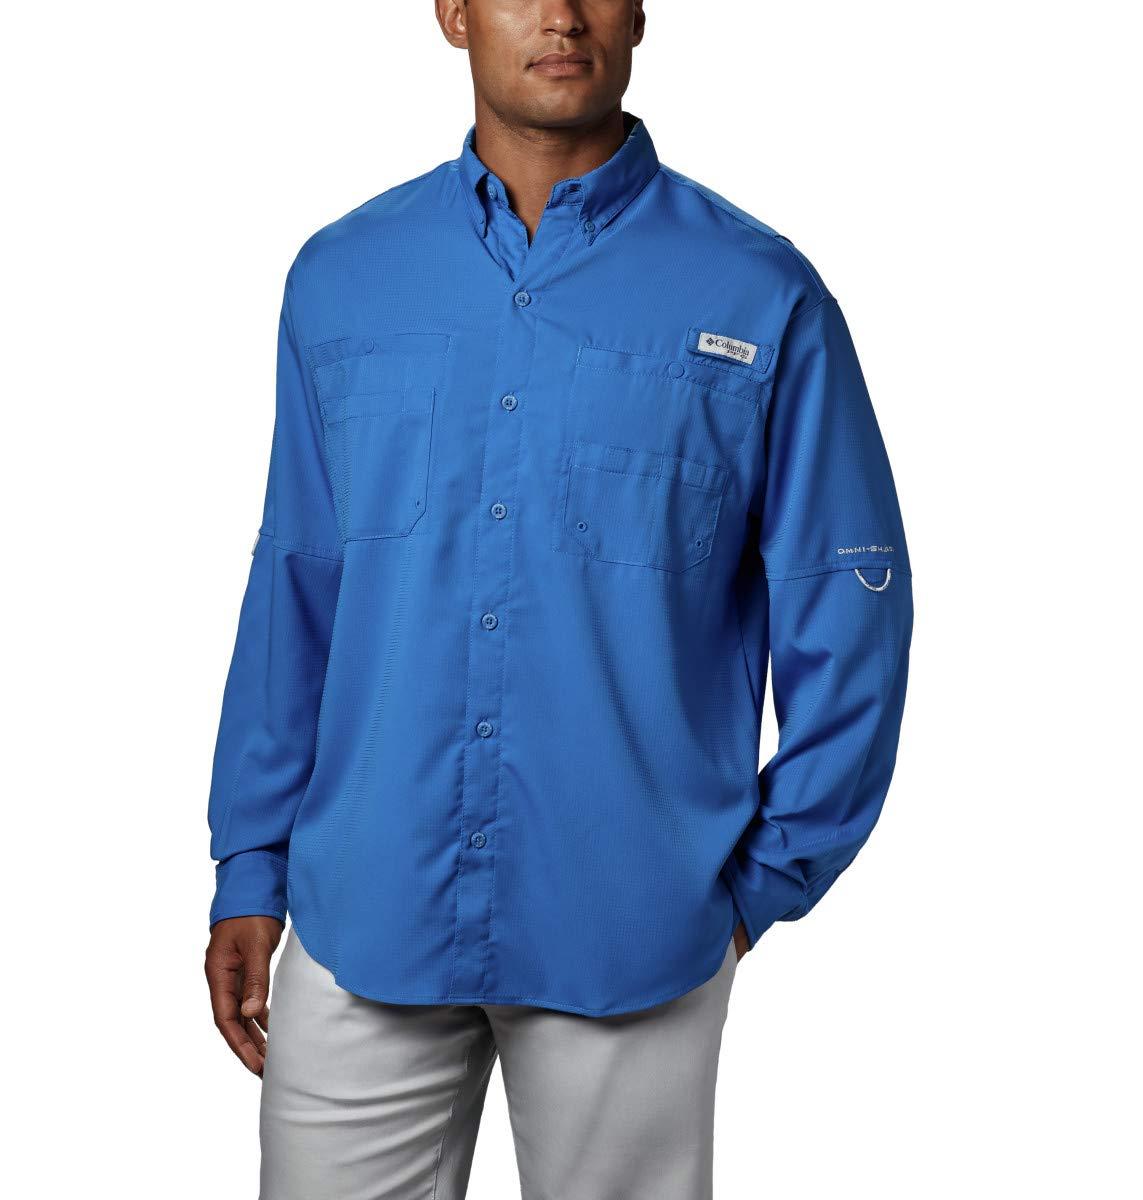 Columbia Men's PFG Tamiami II Long Sleeve Shirt - Big , Vivid Blue, X-Small